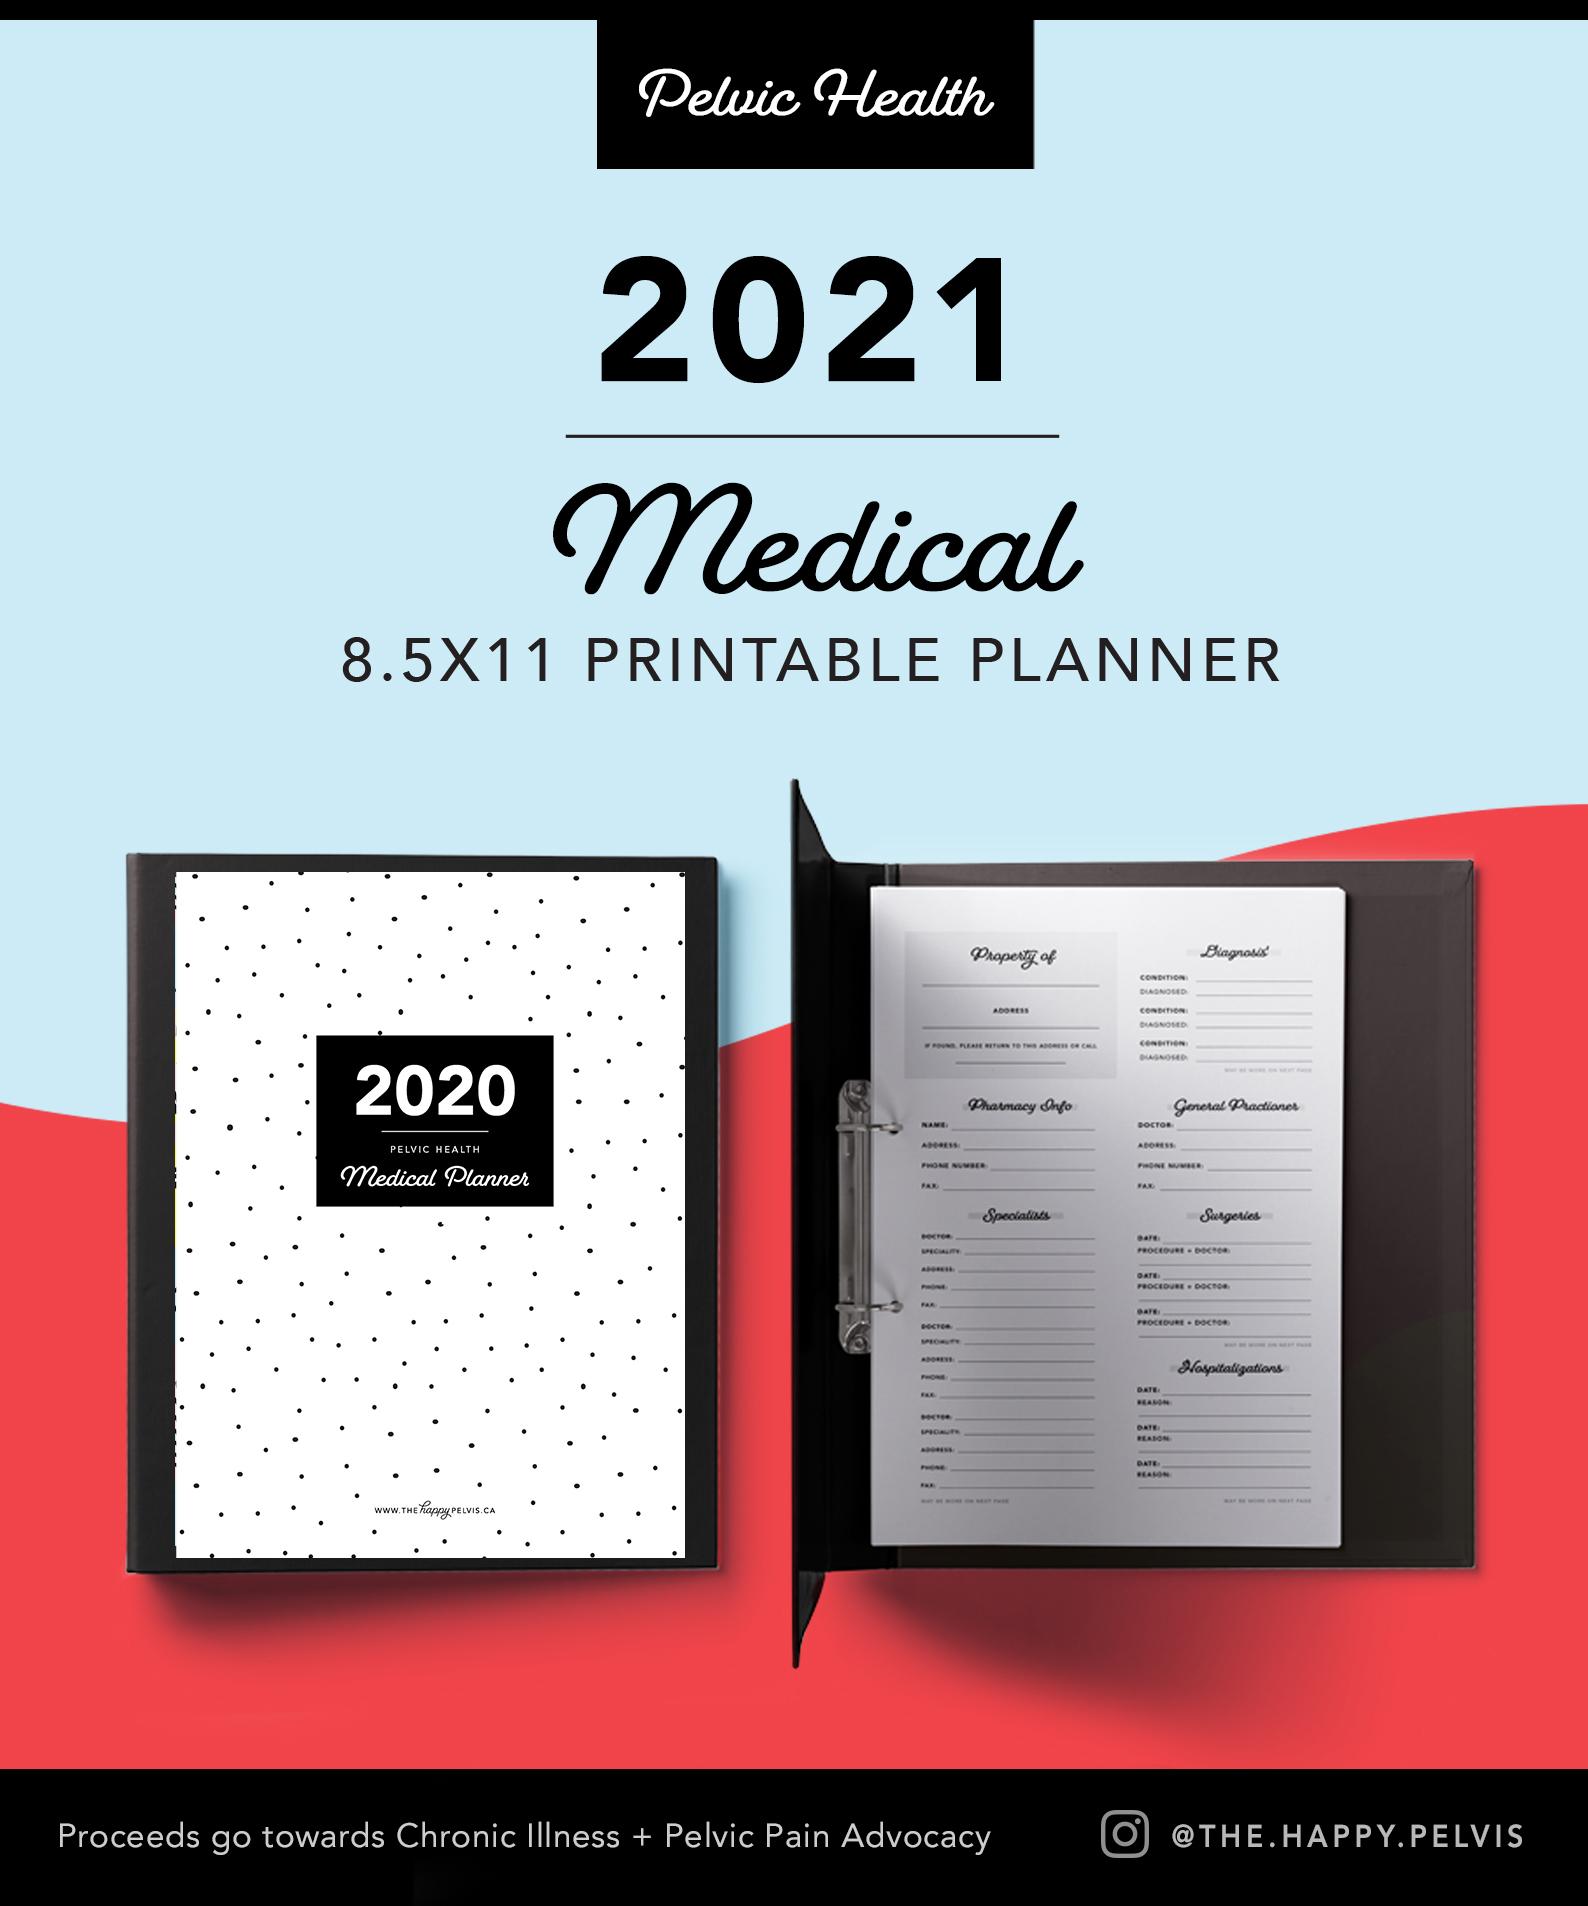 2021 Printable Medical Planner